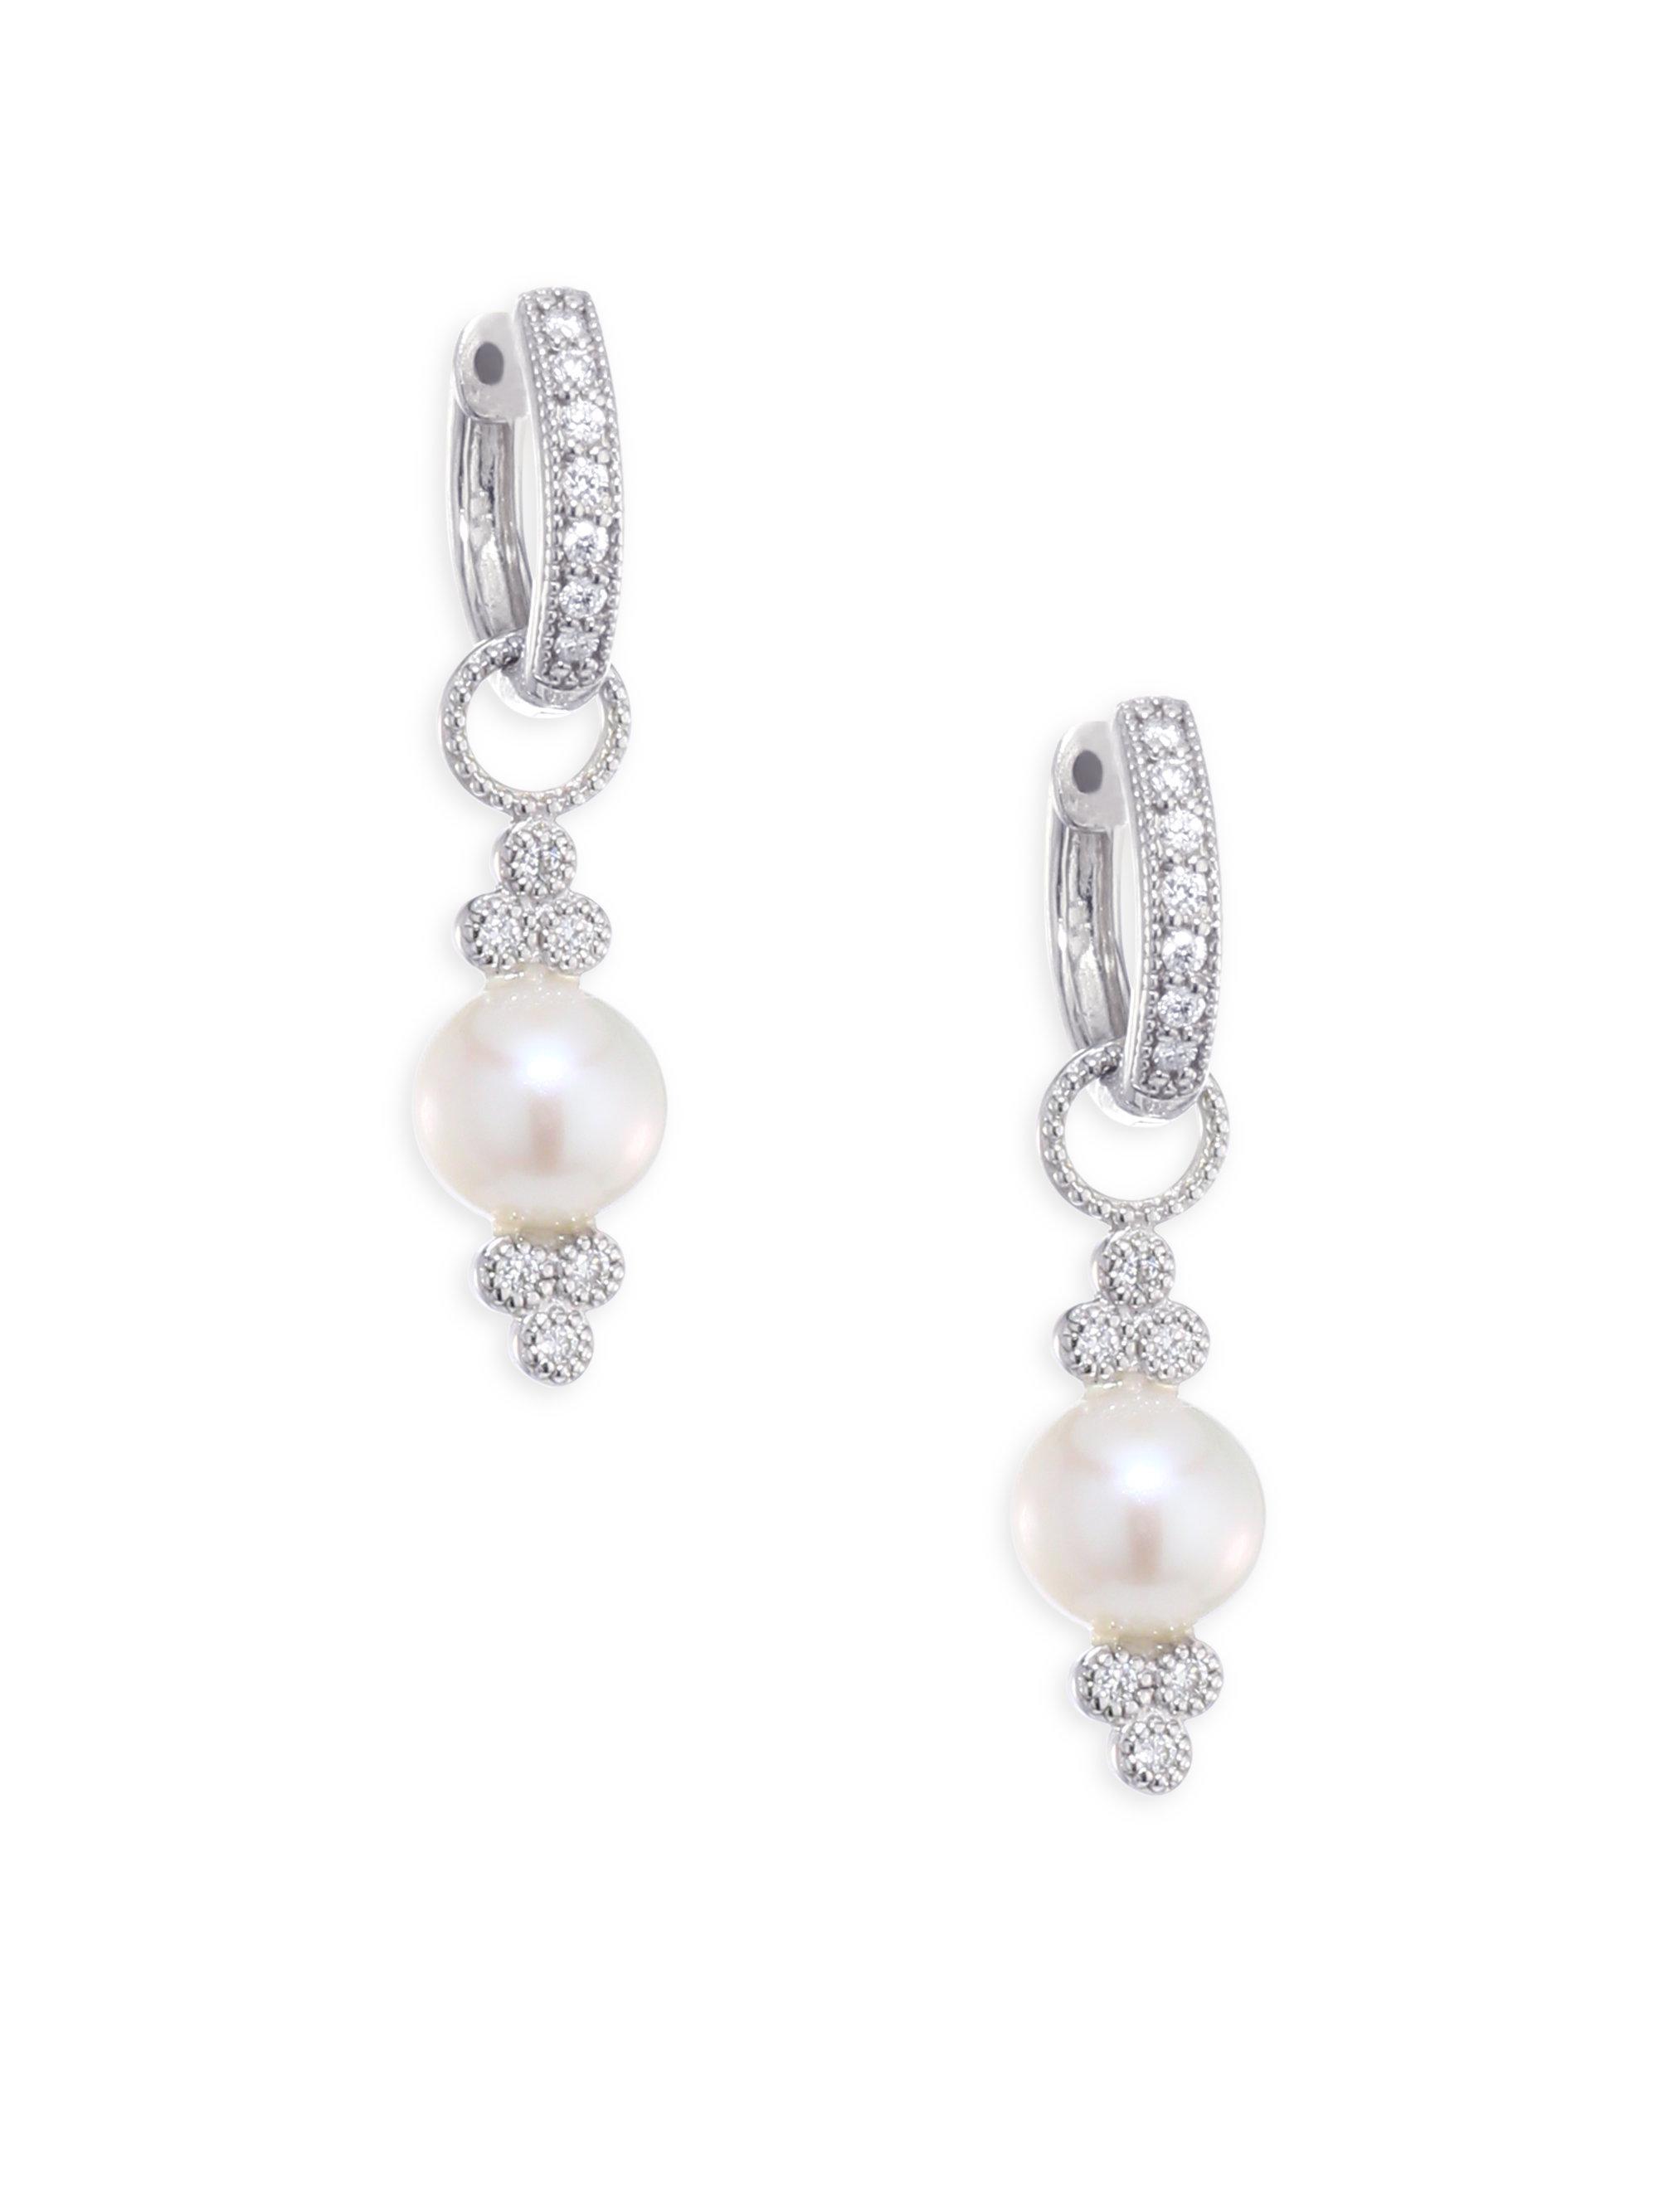 Jude Frances Provence Pearl & Diamond Earring Charms TwPoTBdm